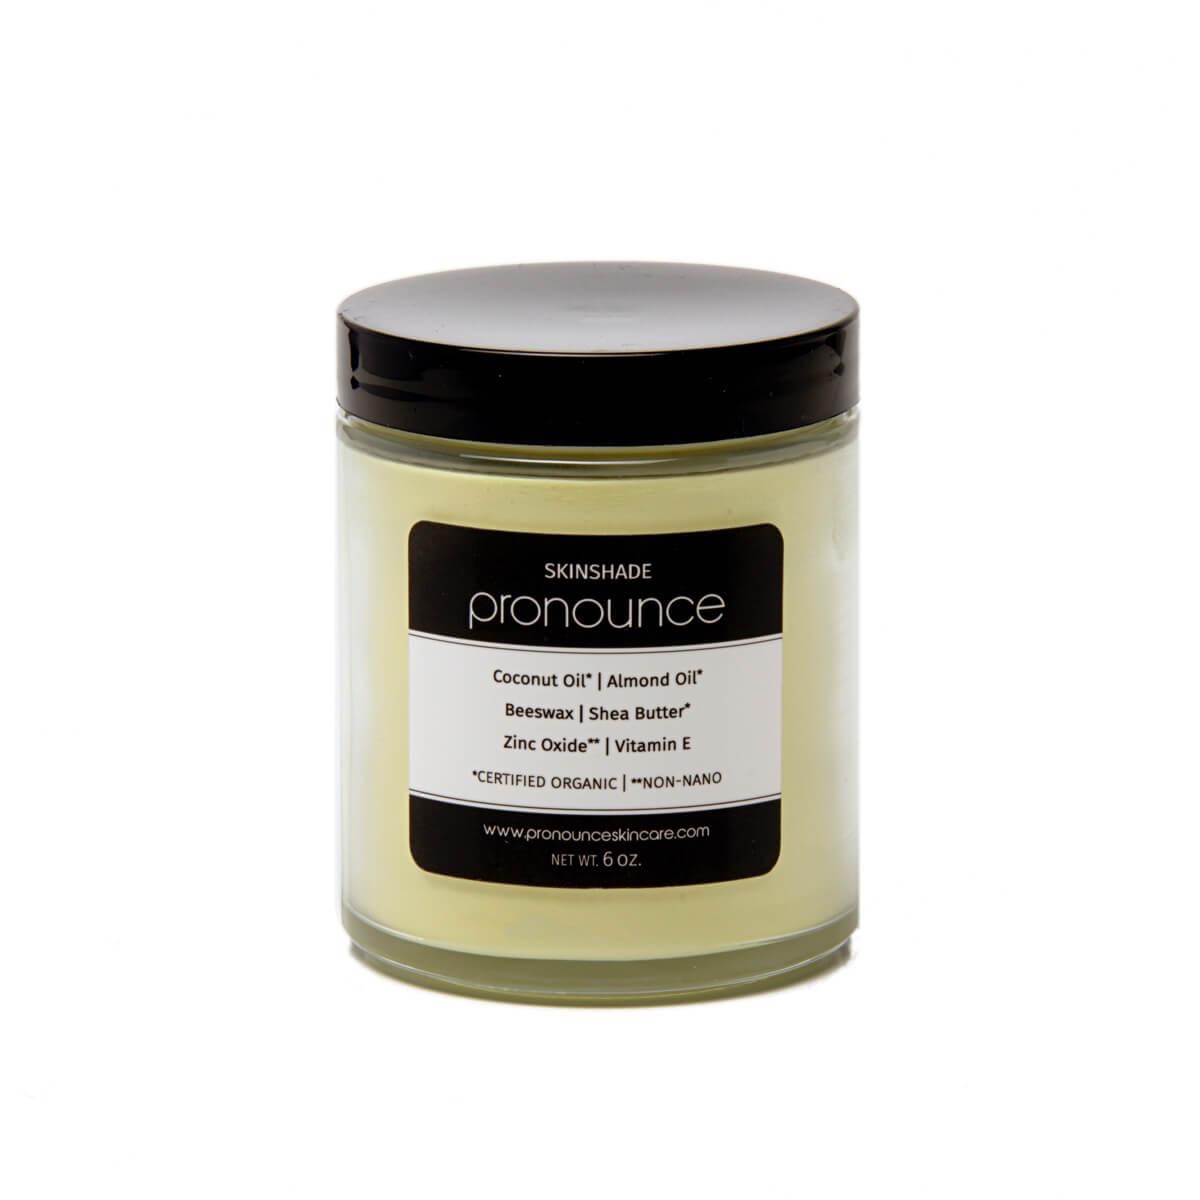 SkinShade 6oz - Pronounce Skincare 1200 x 1200